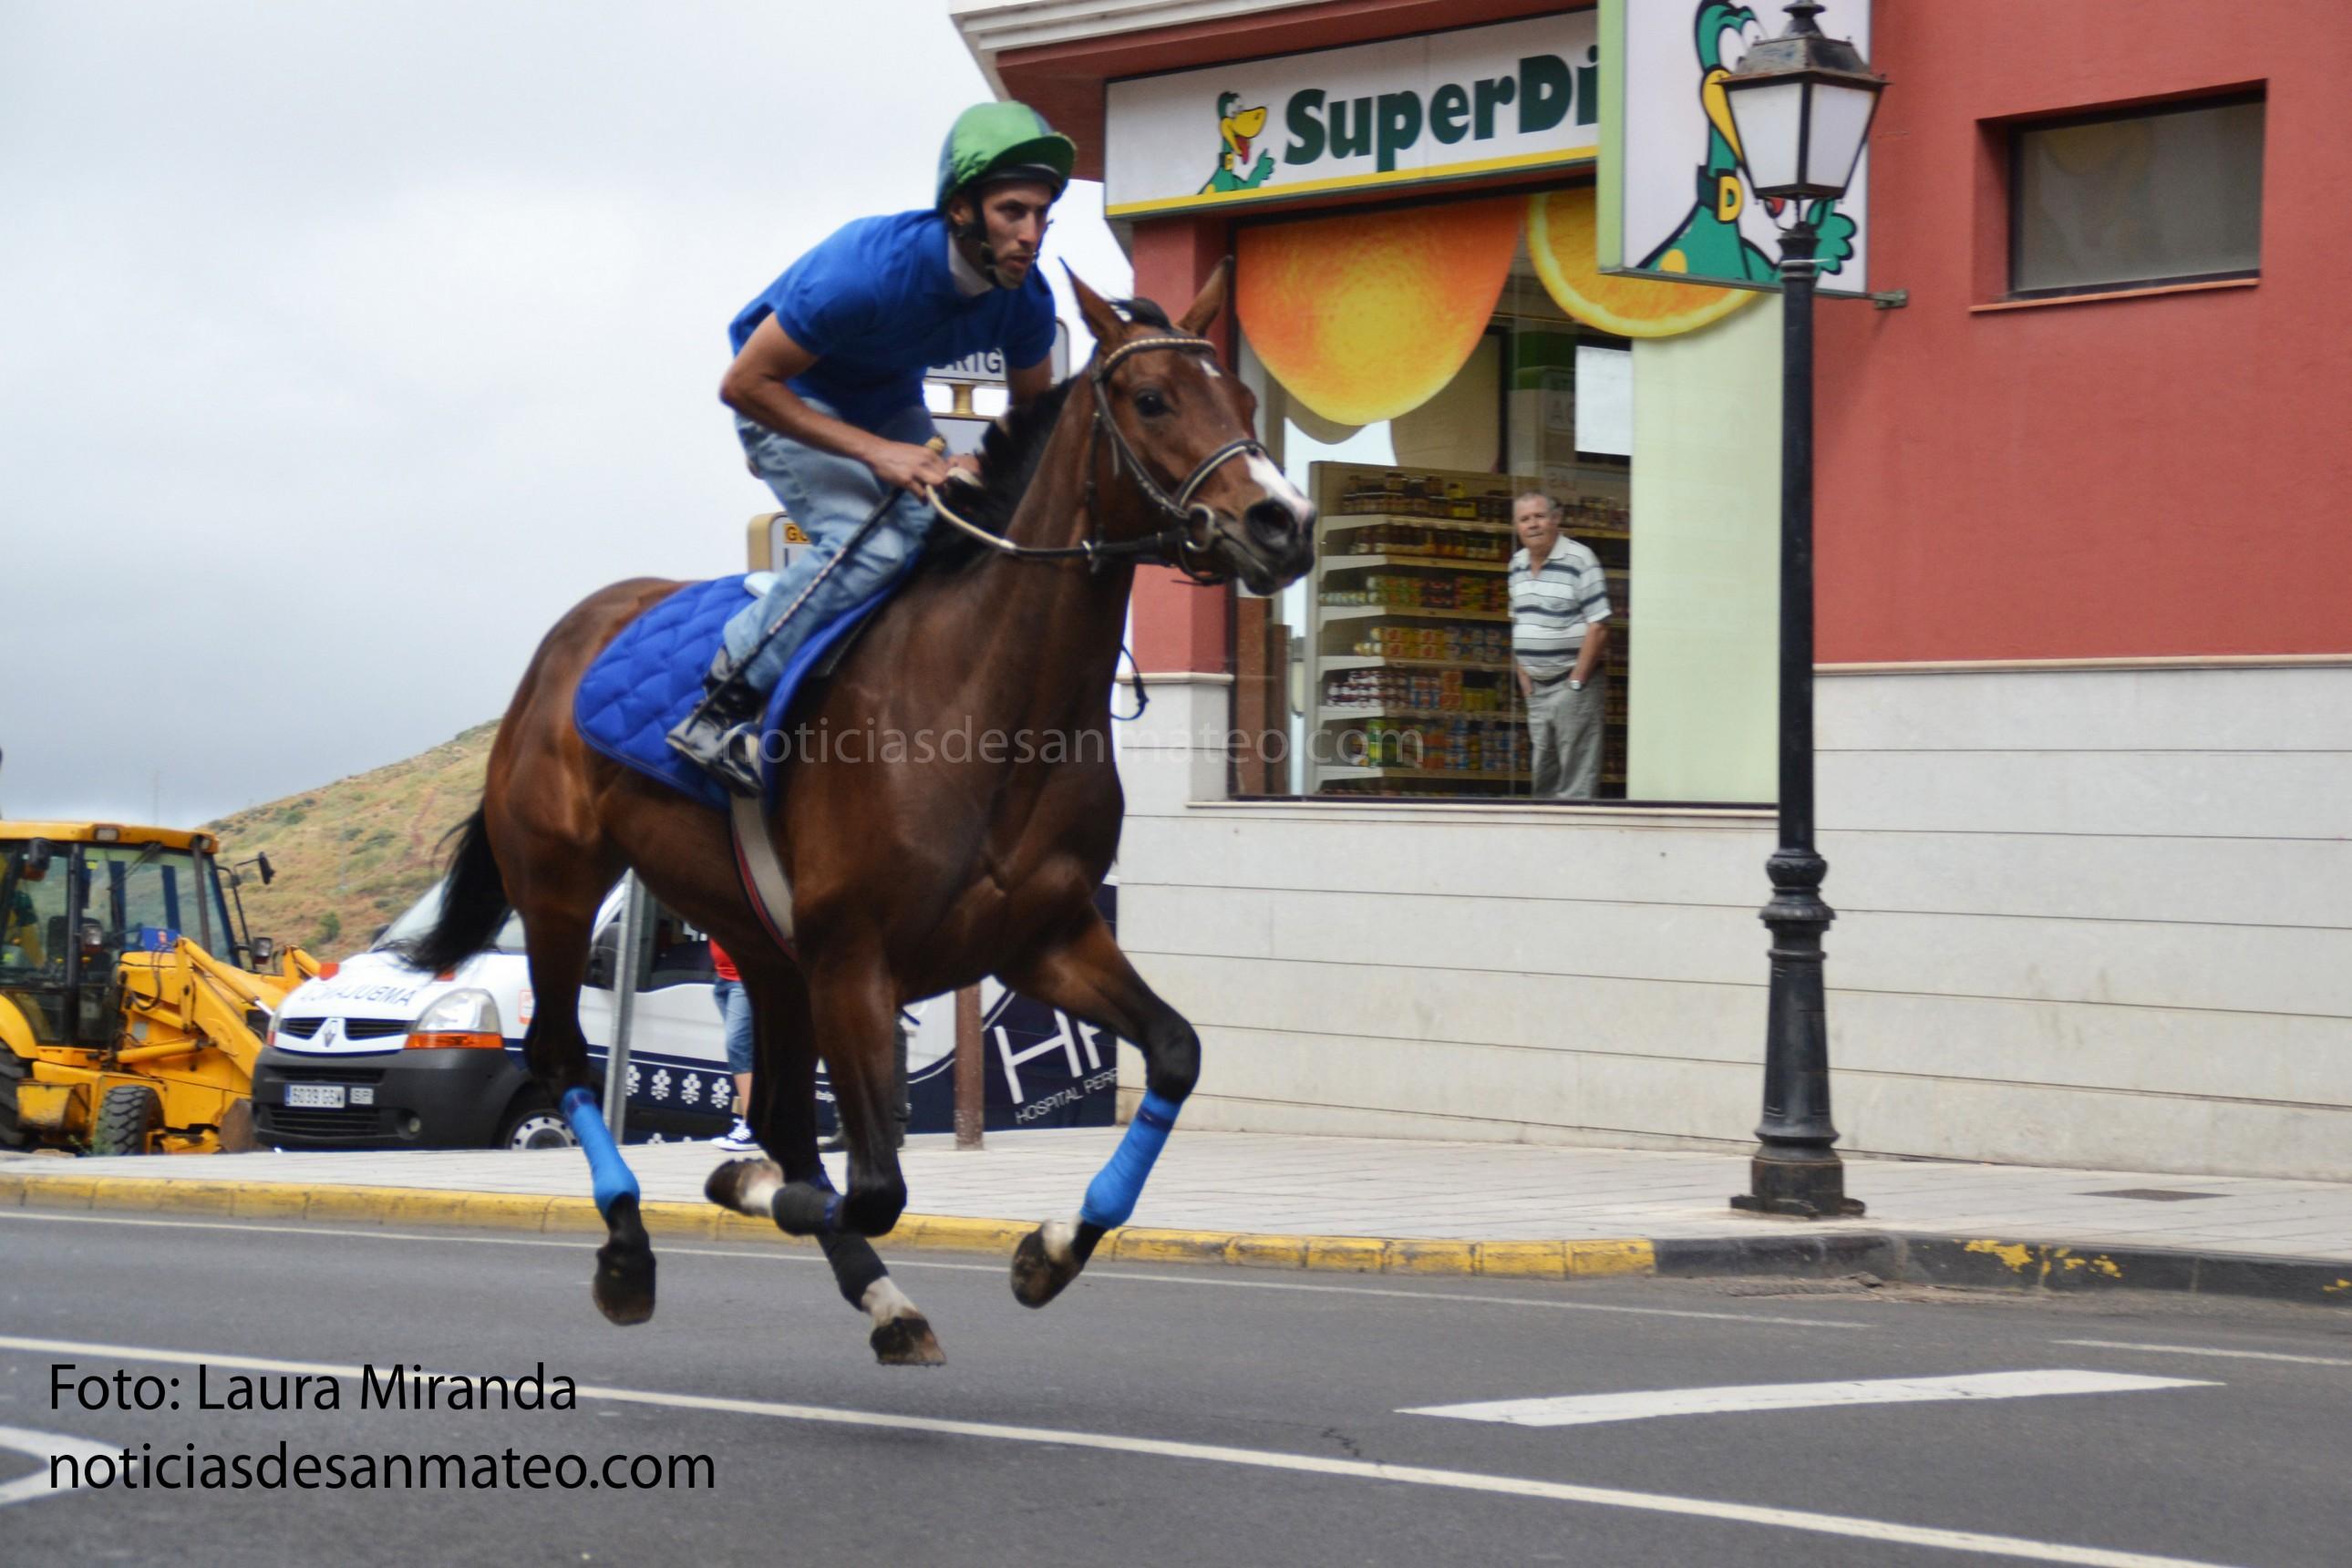 carreras caballos agricultor san mateo julio 2016DSC 14232